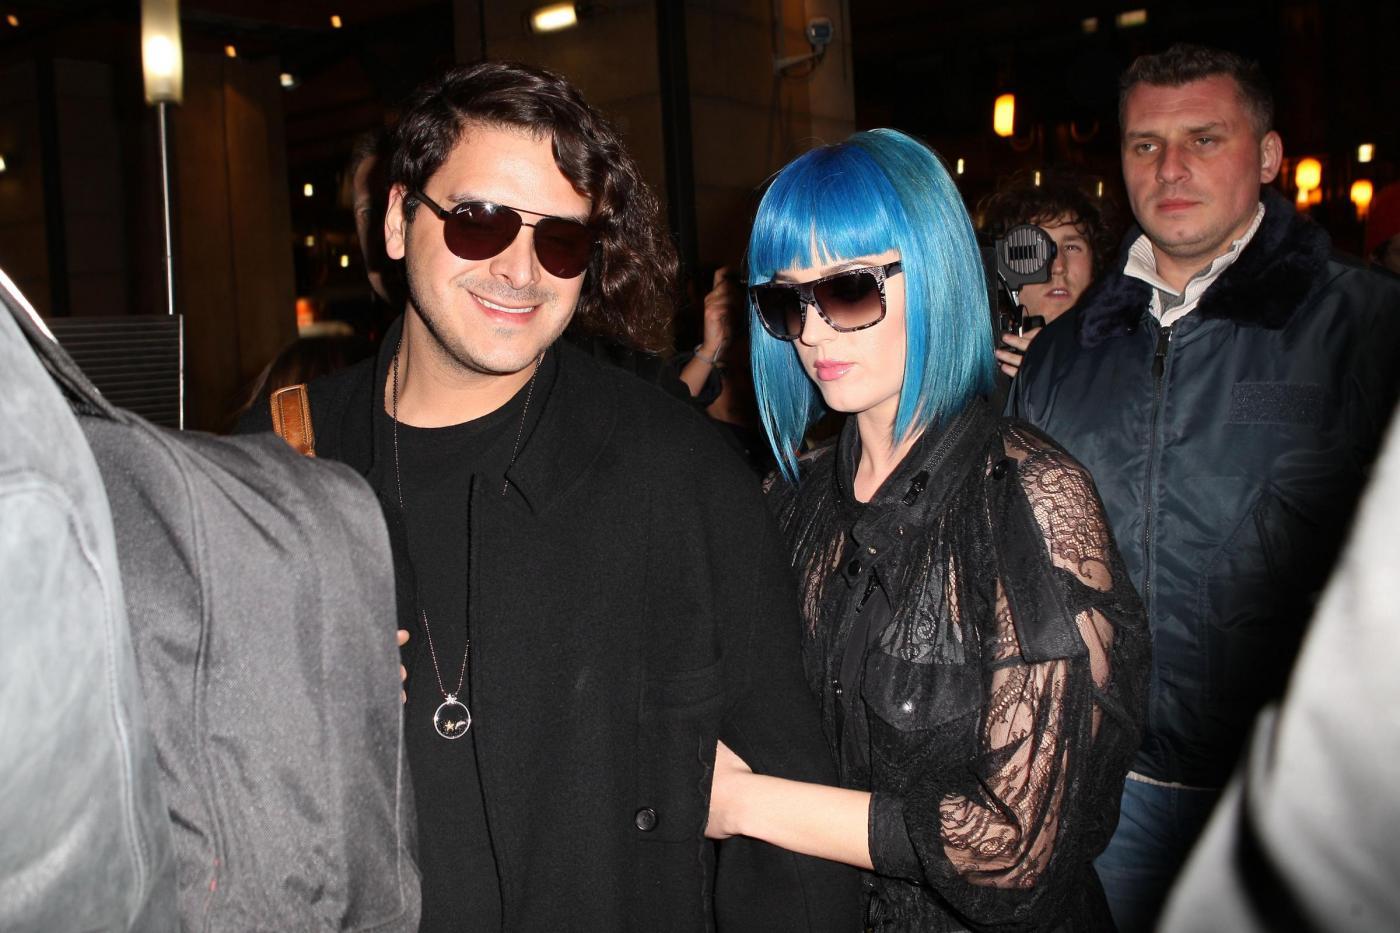 Katy Perry e Baptiste Giabiconi a Parigi 01